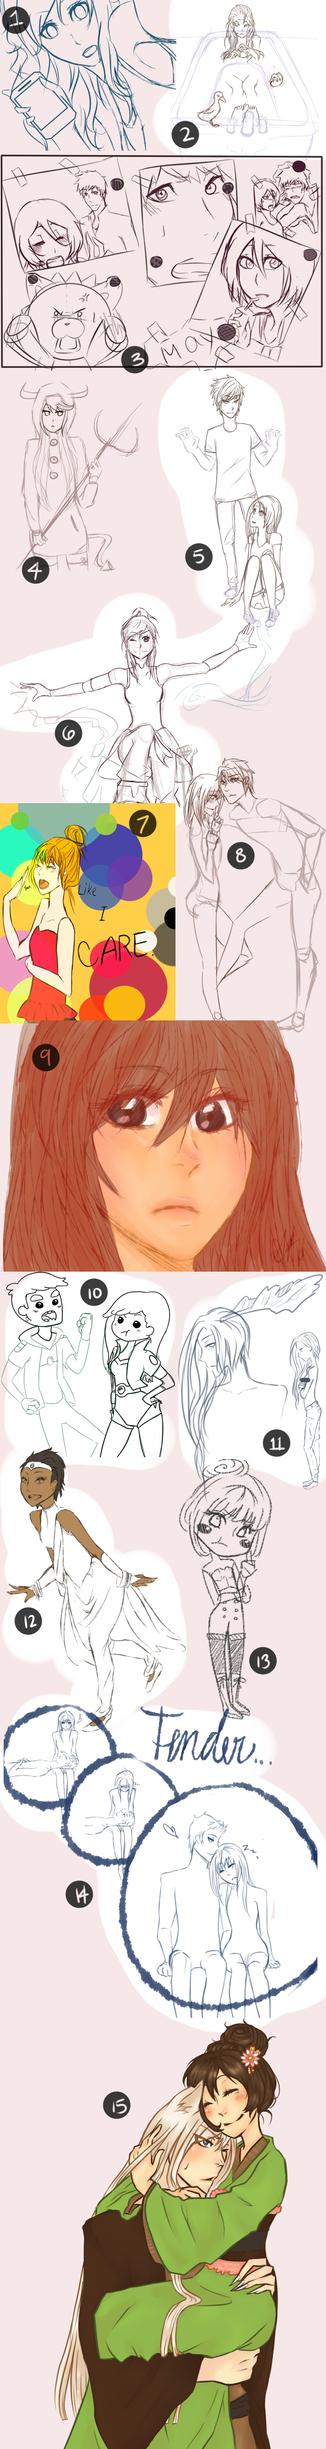 Sketch Dump 01 by k-k-katie